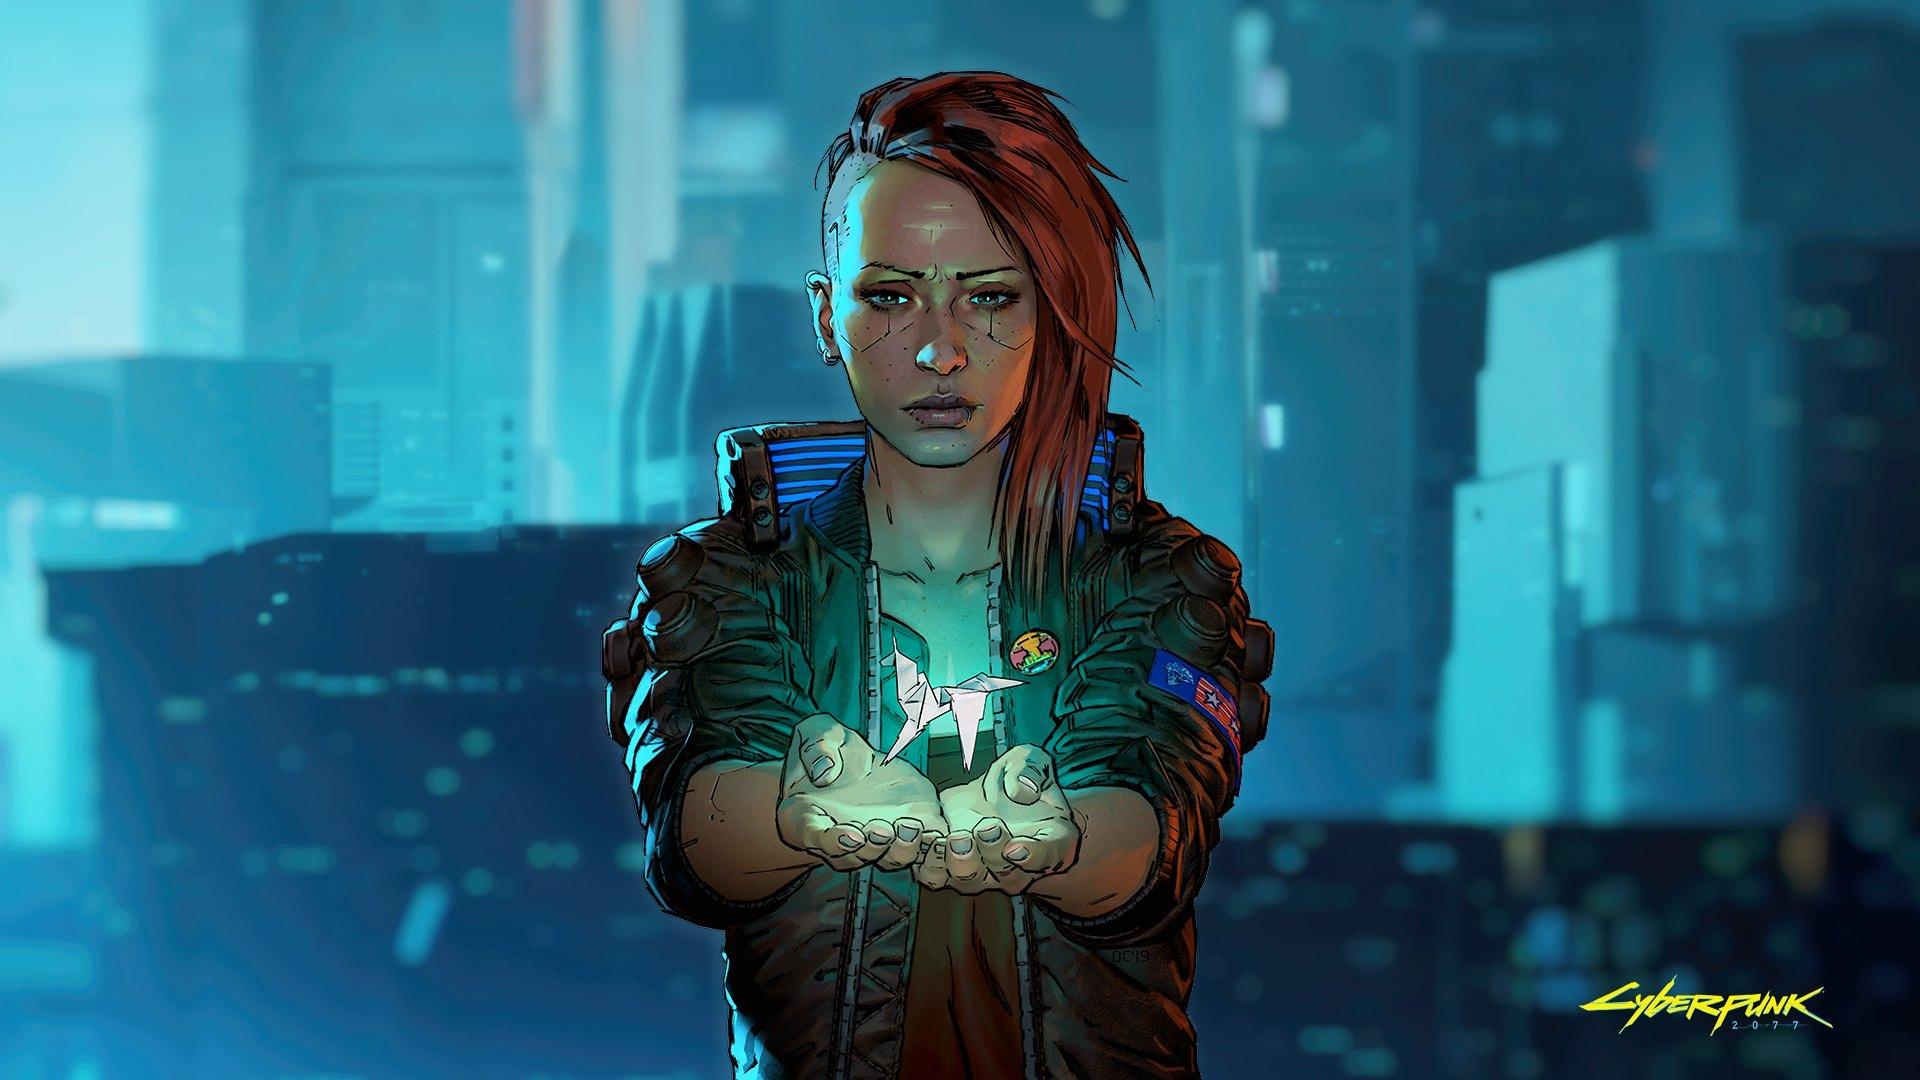 Cd Projekt Redが サイバーパンク77 を各国のレーティング審査機関に提出 ゲームは日に日に良くなっている Game Spark 国内 海外ゲーム情報サイト